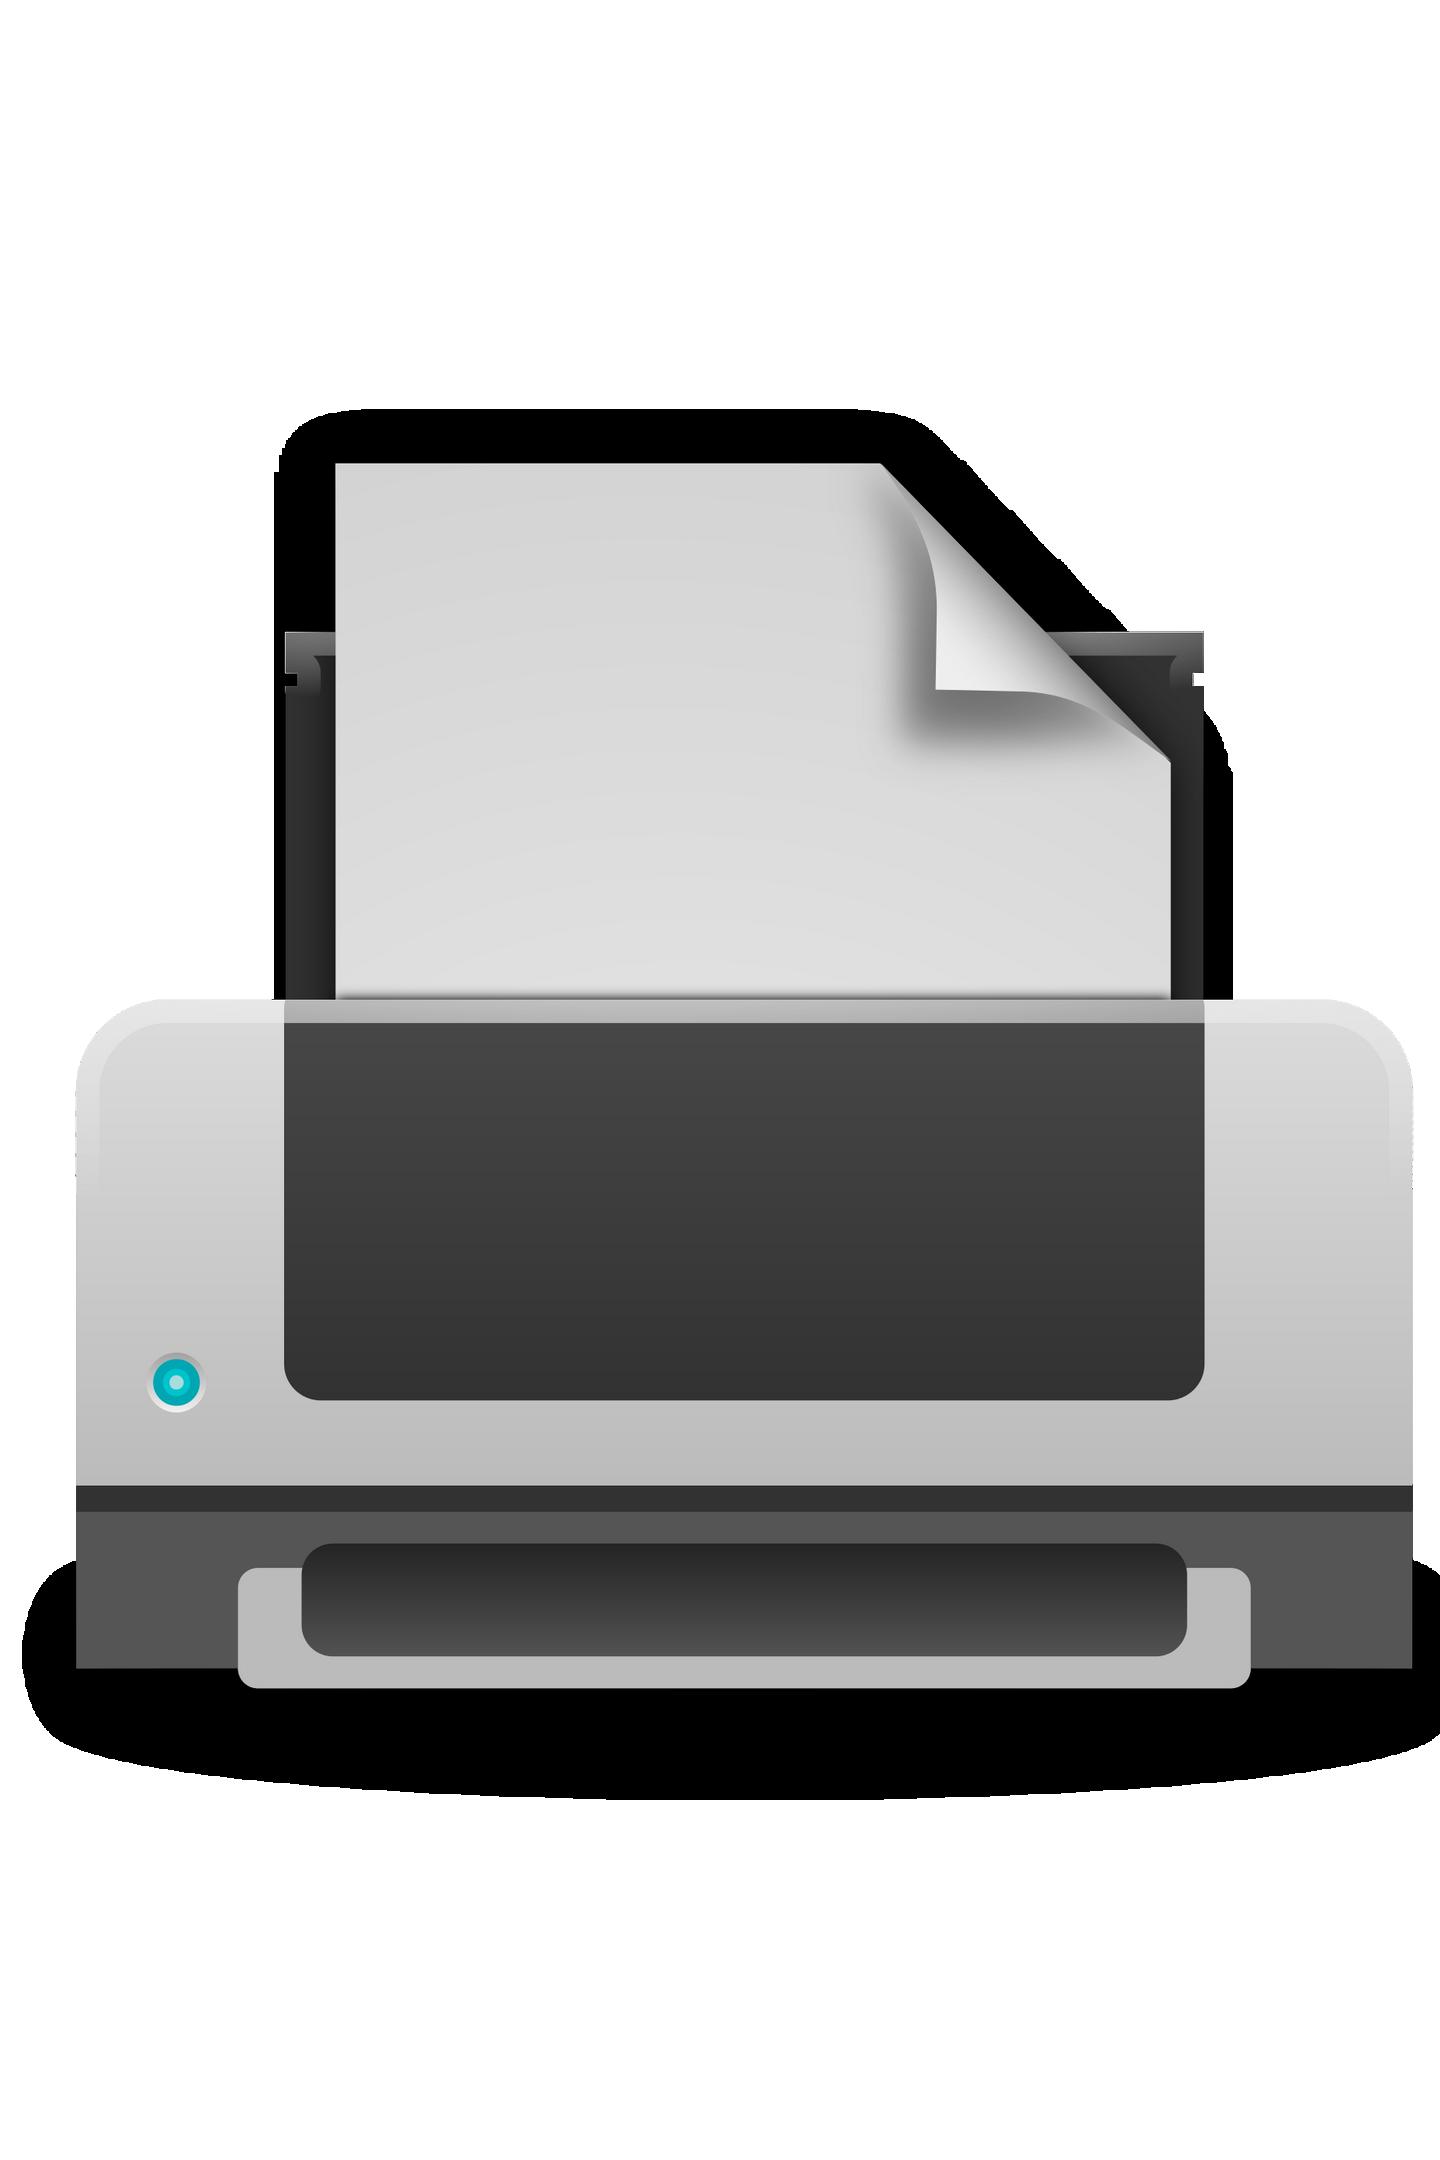 label printer create and print labels free iphone ipad app market